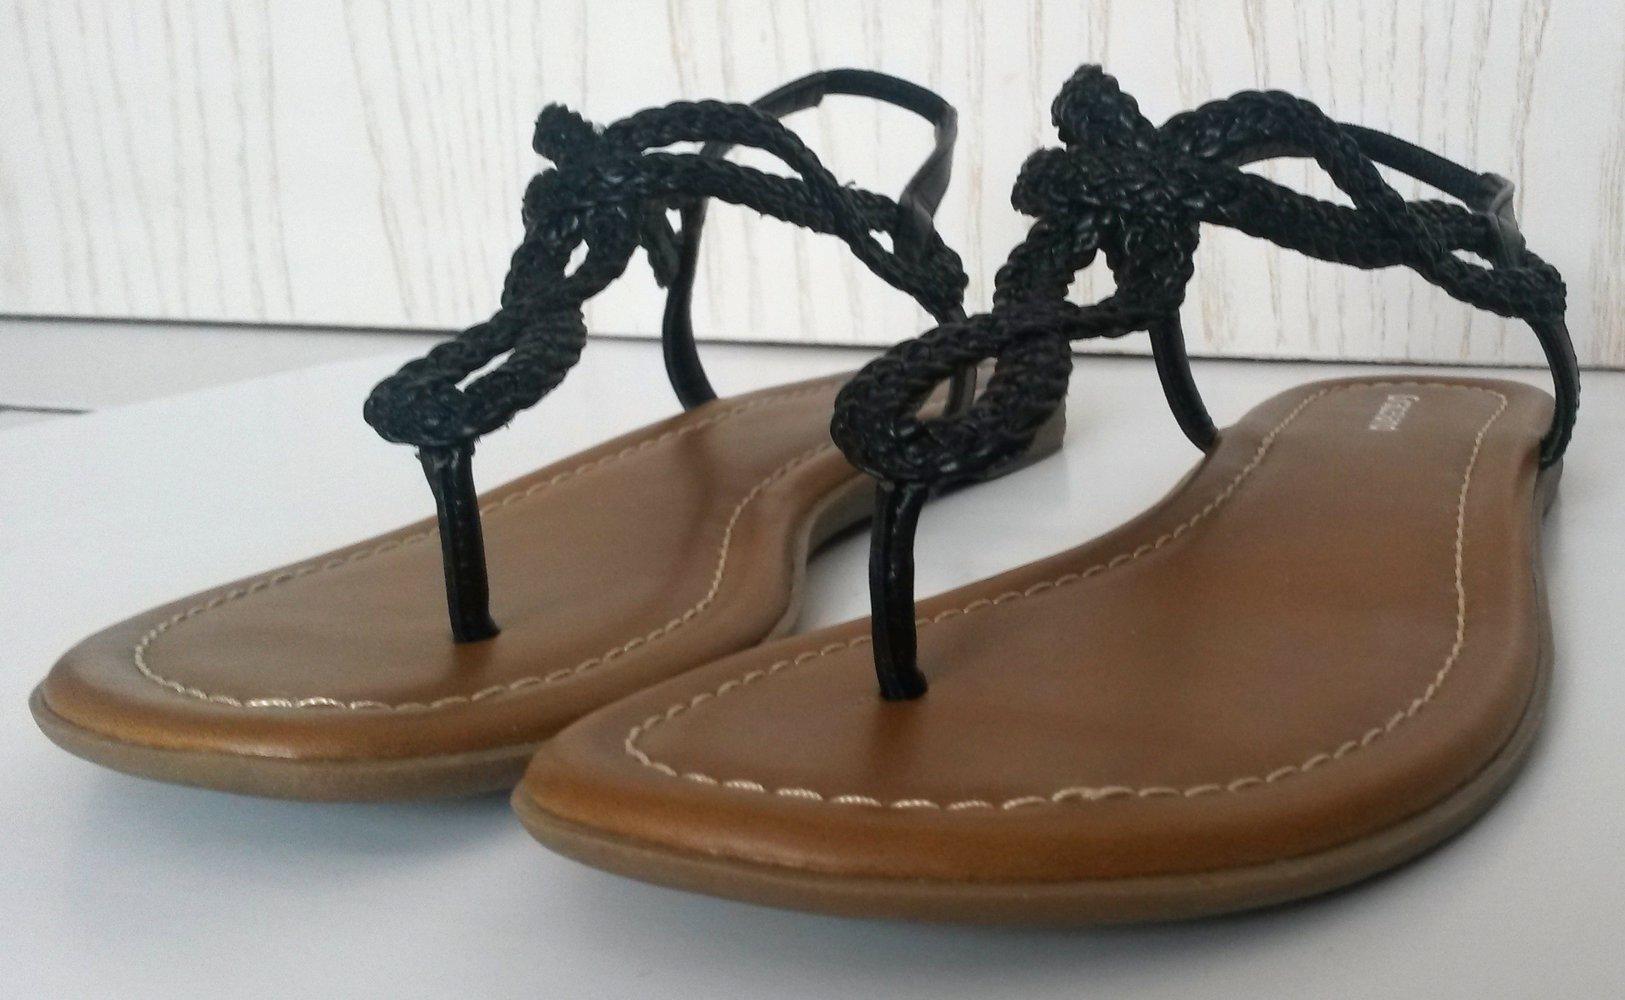 Graceland - GRACELAND   Sandalen mit geflochtenen Riemen ... 21ef952e1d